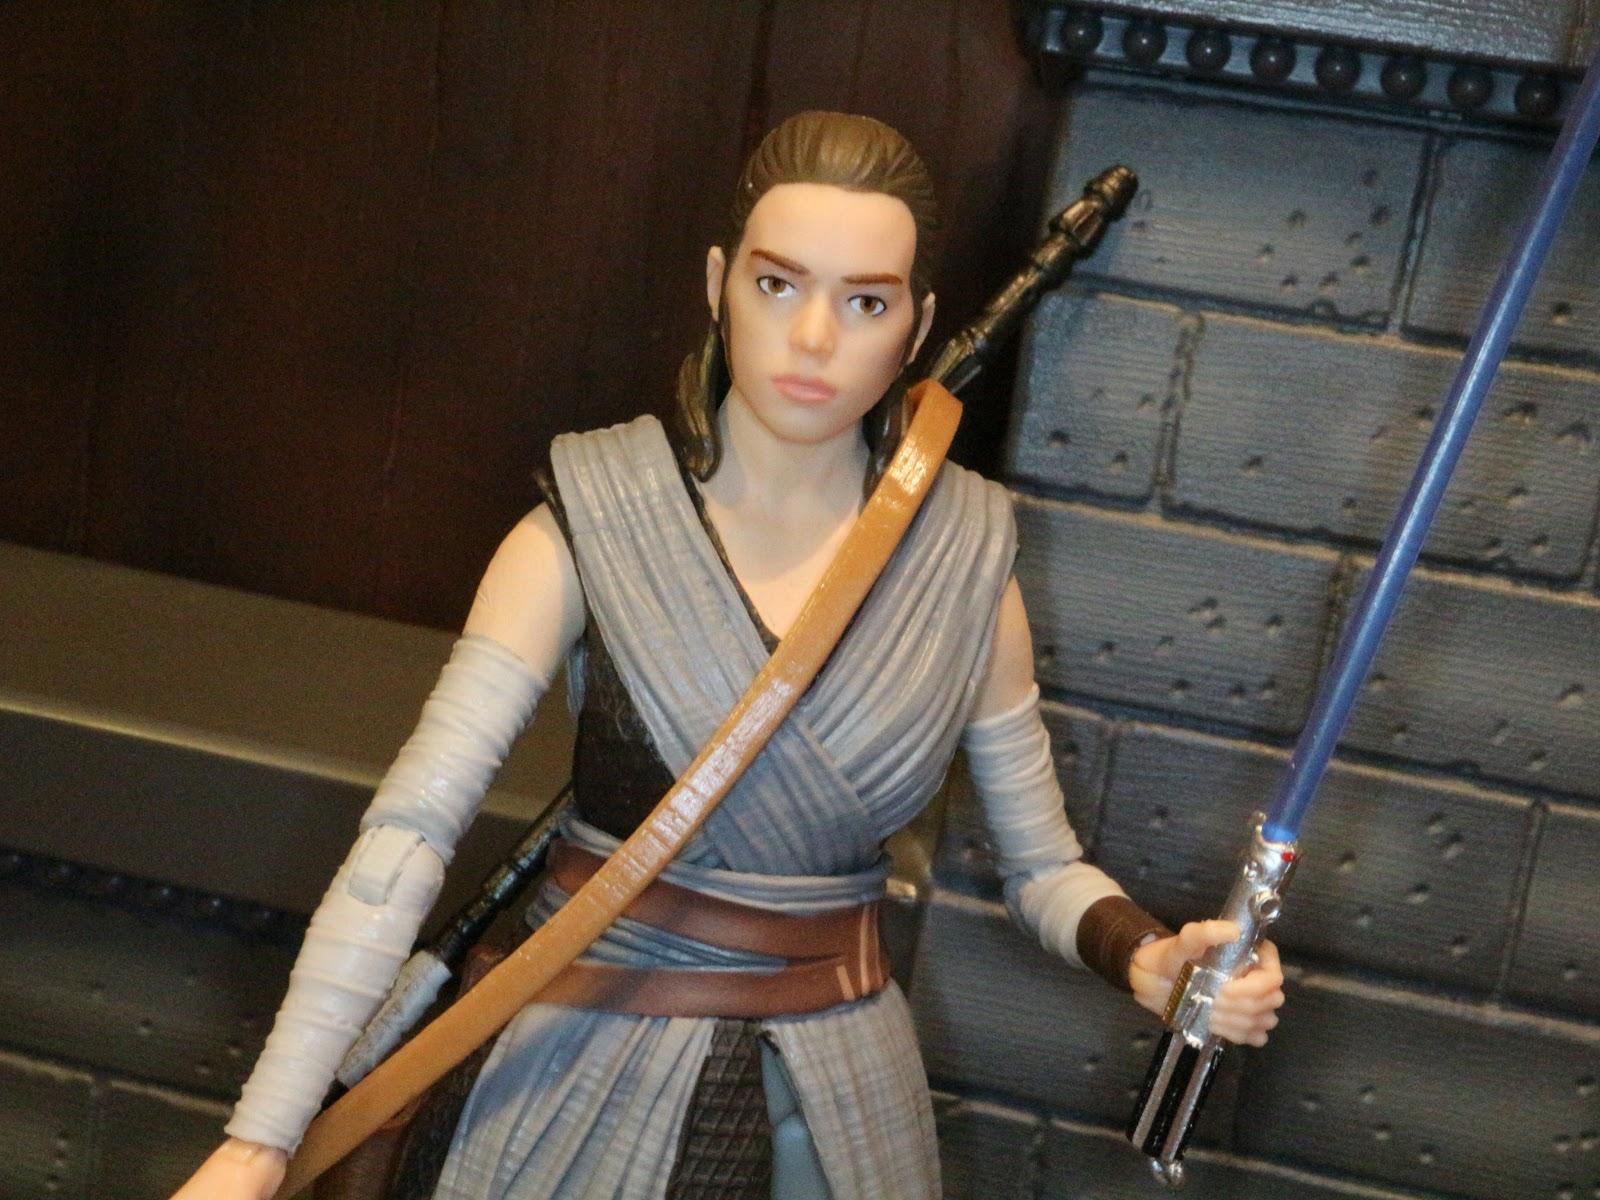 Rey: Action Figure Barbecue: Road To The Last Jedi: Rey (Jedi